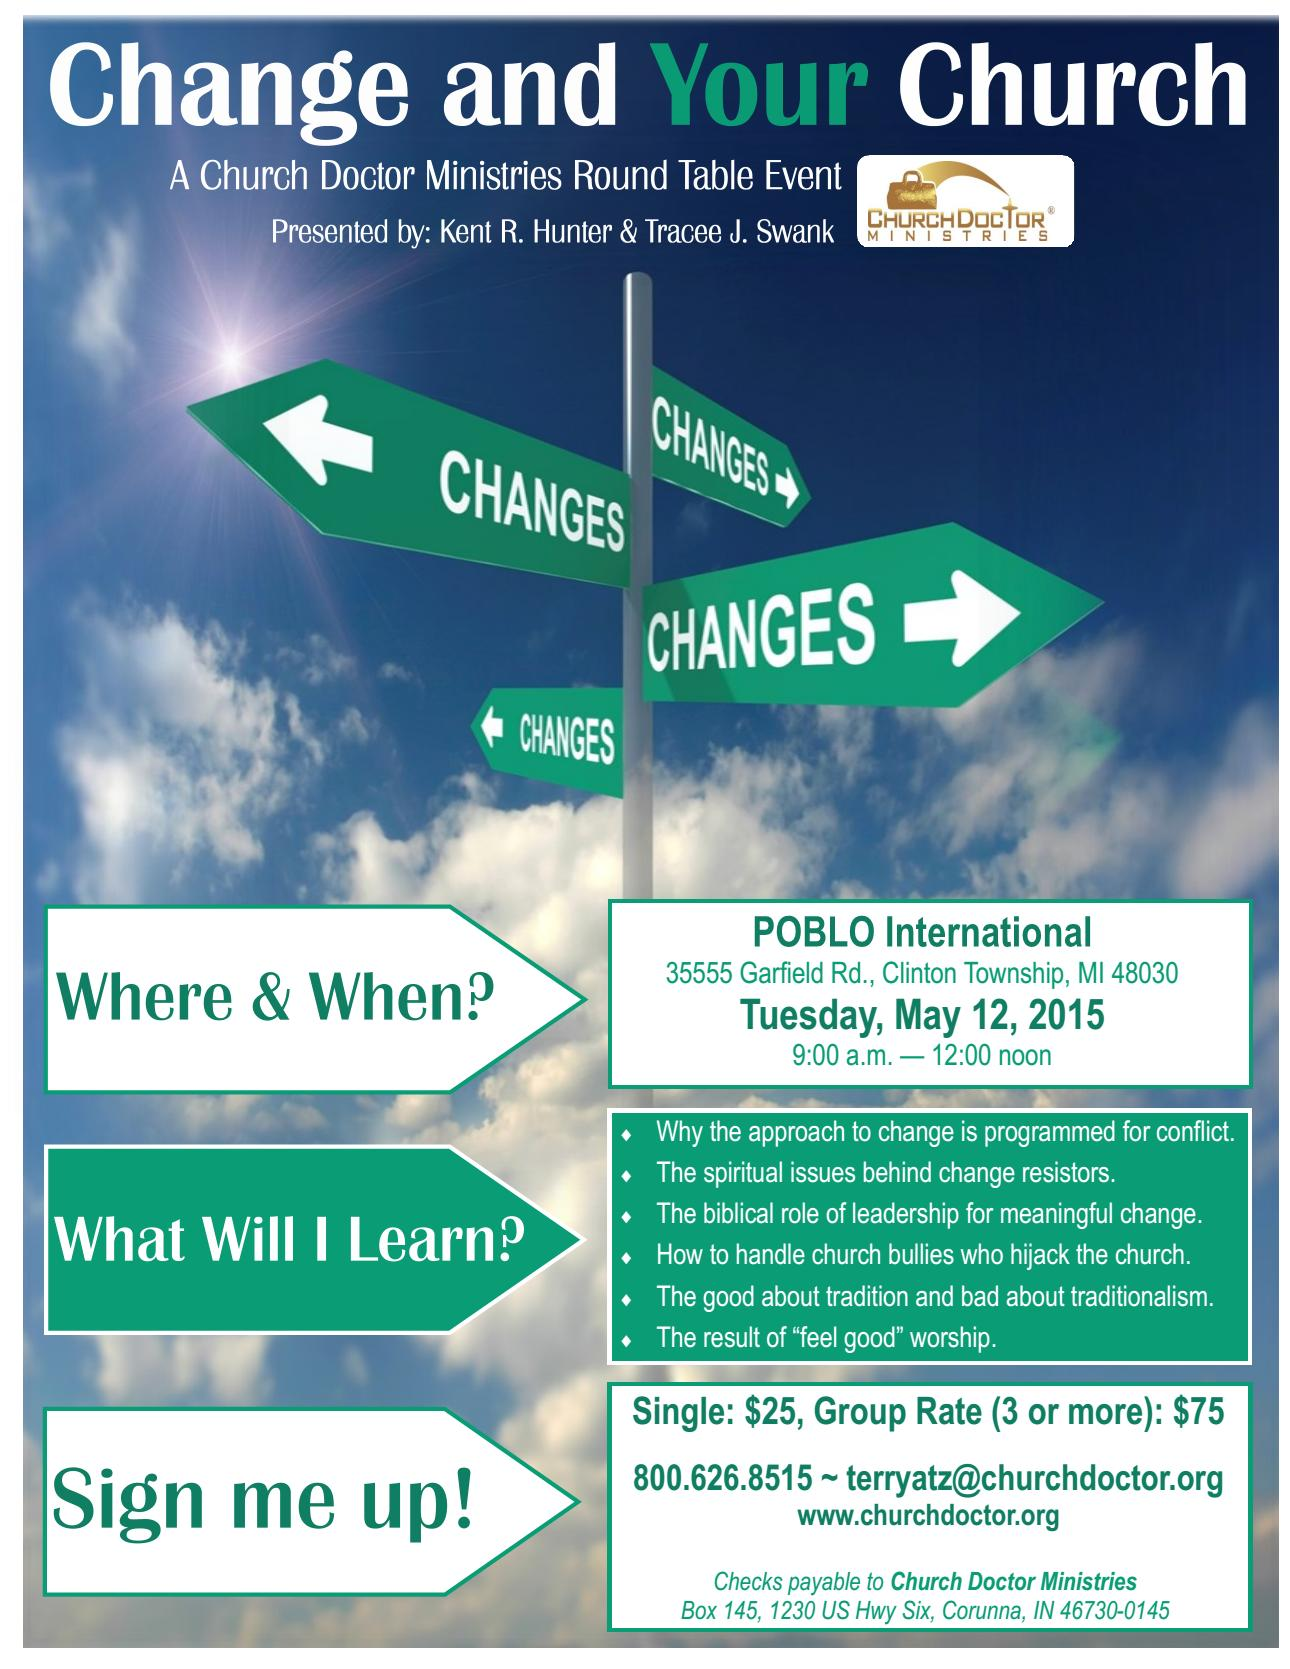 ChangeAndYourChurch-ClintonTwspMI-5-12-15